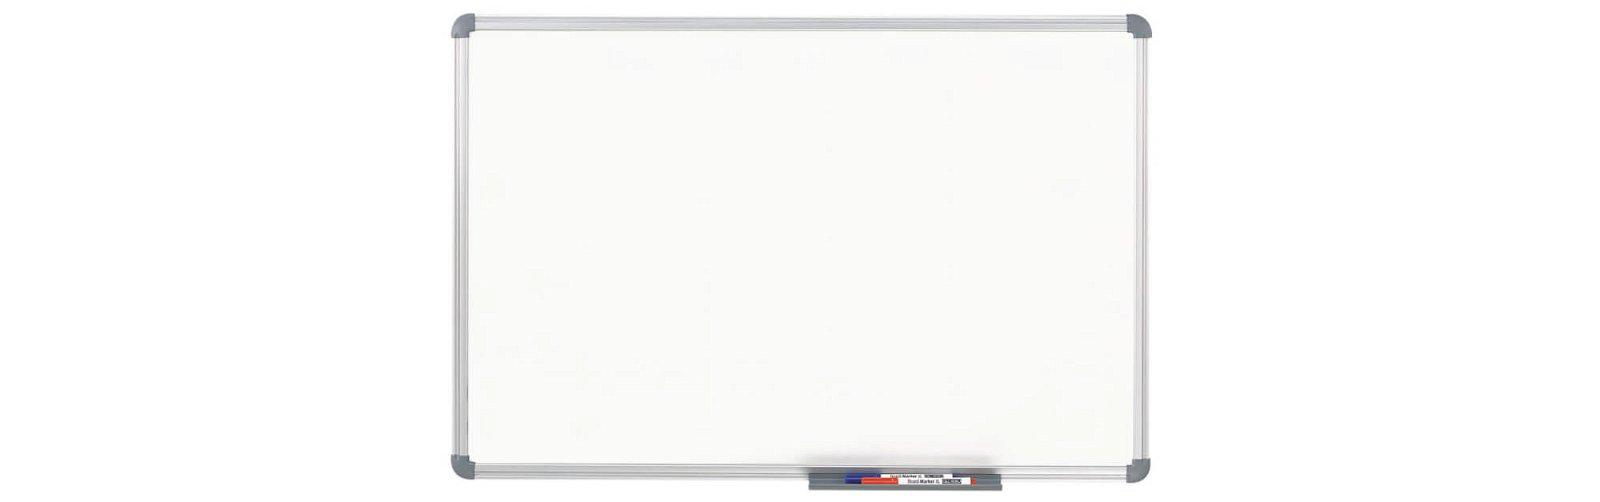 Whiteboard MAULoffice, Emaille, 100x150 cm, grau